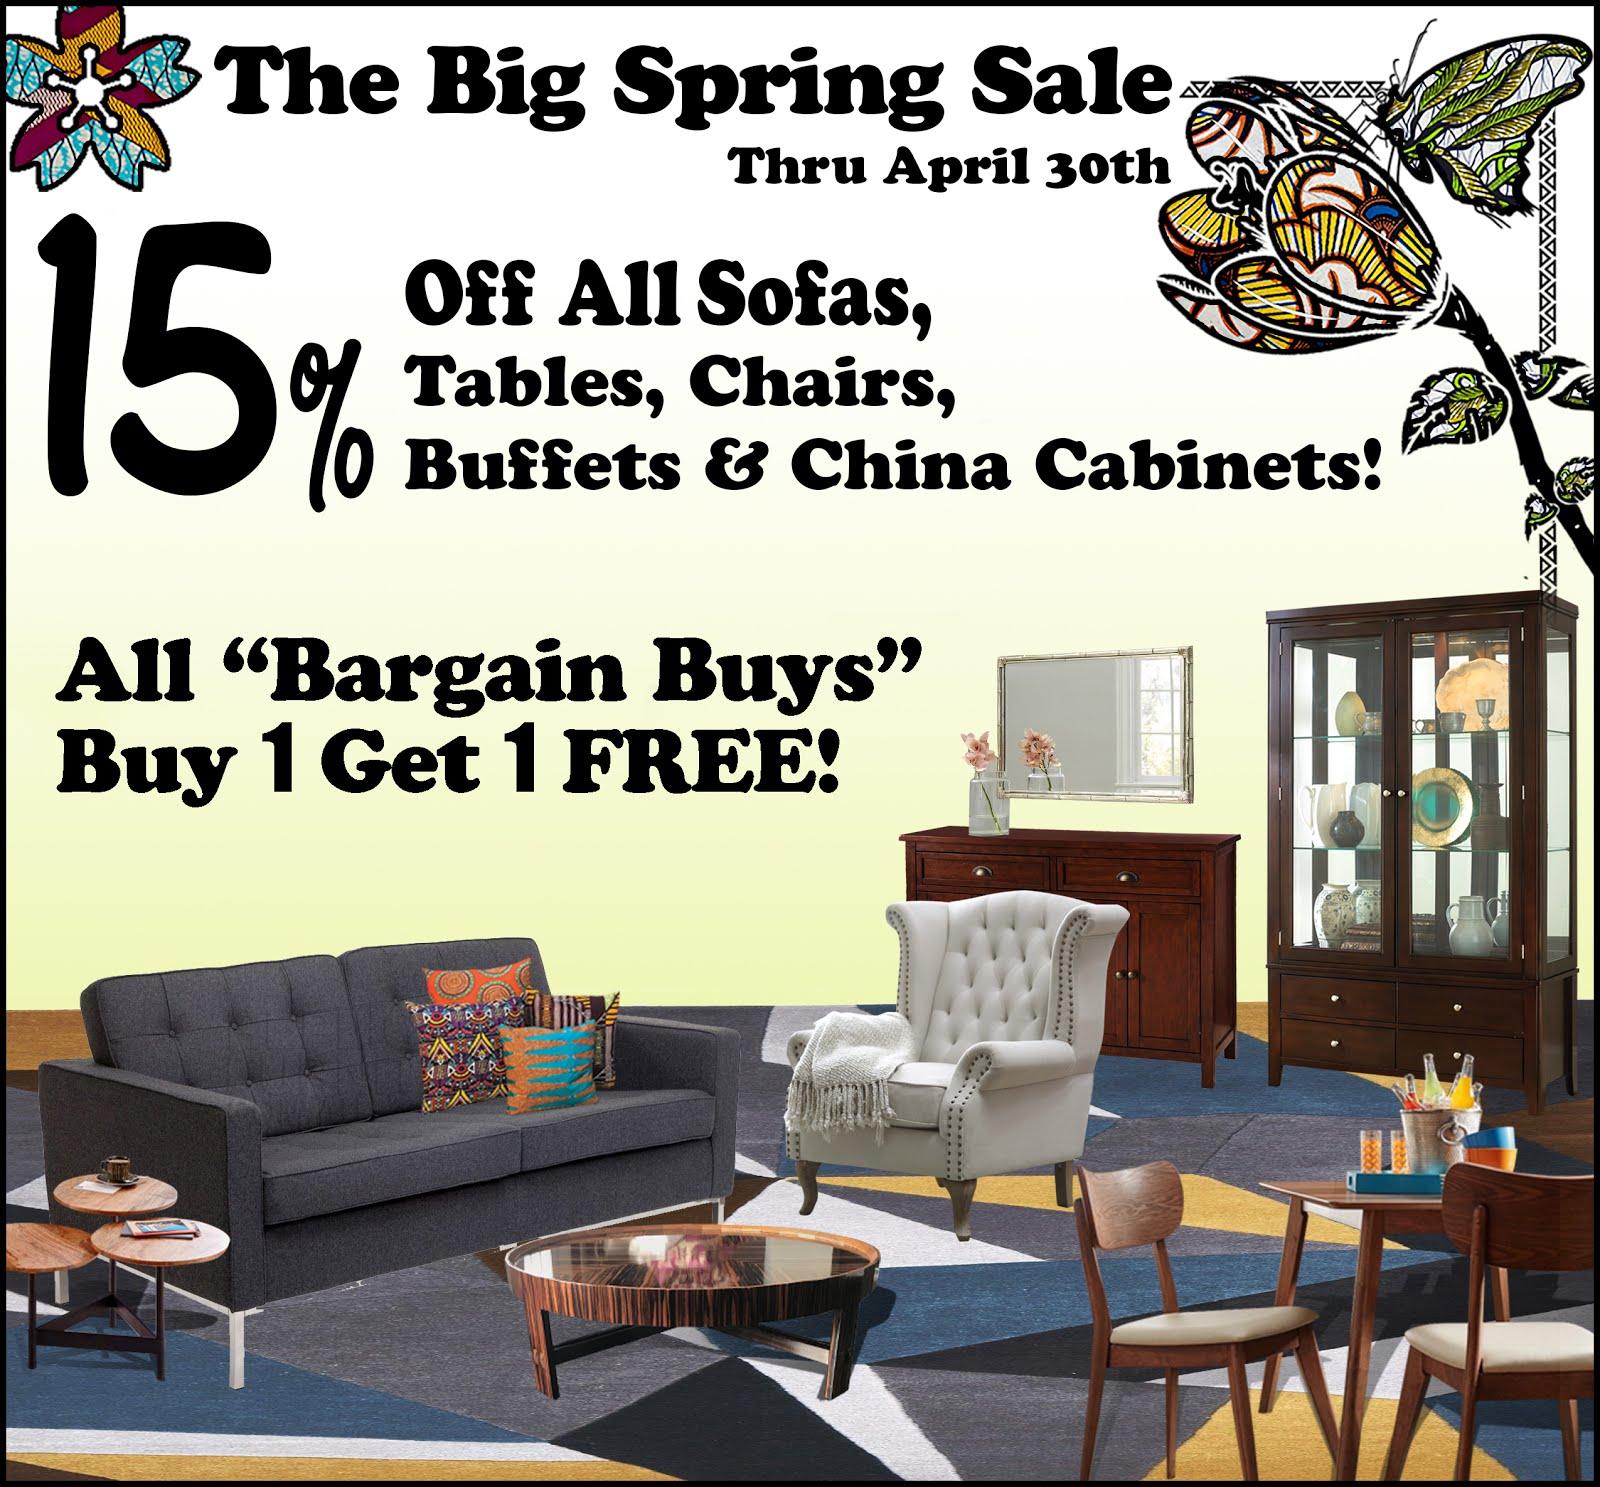 The Big Spring Sale!